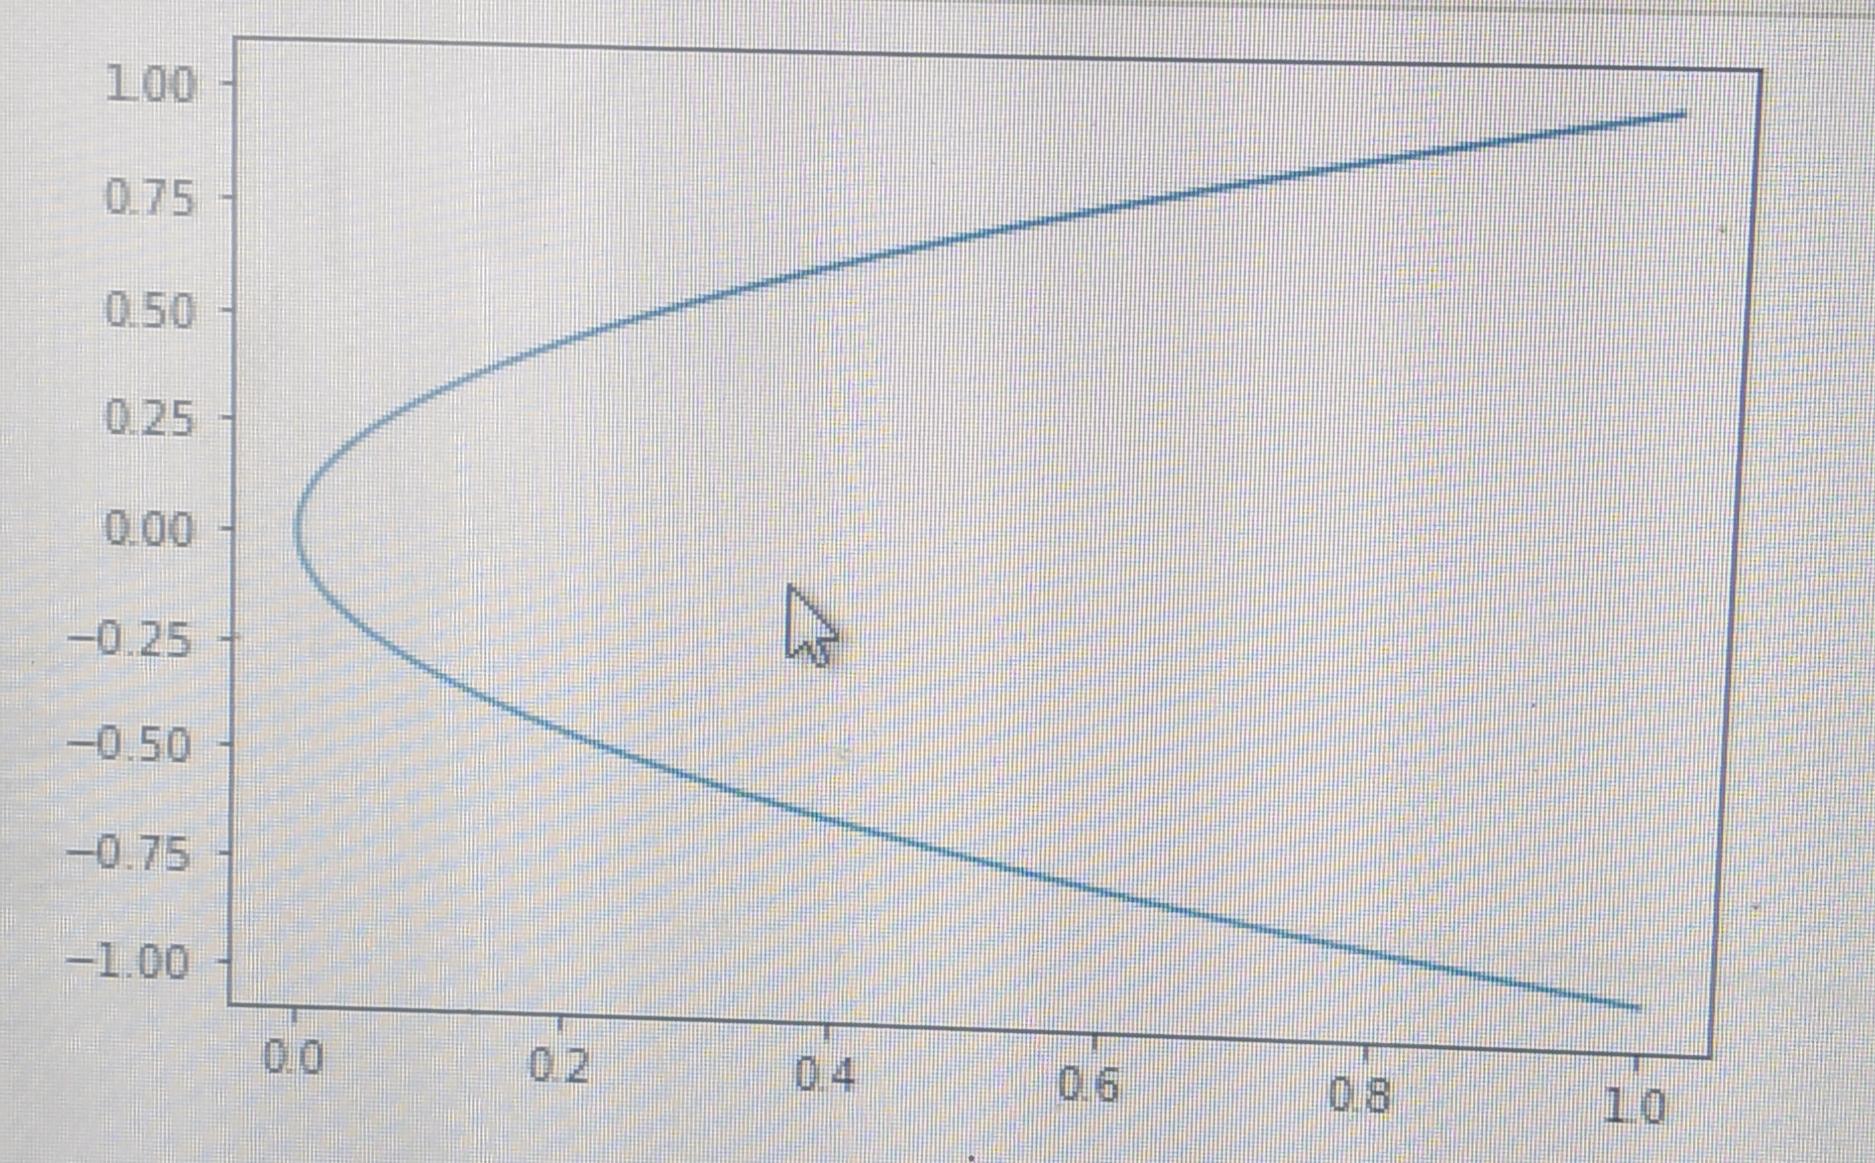 plot simple parabola using matplotlib in Python